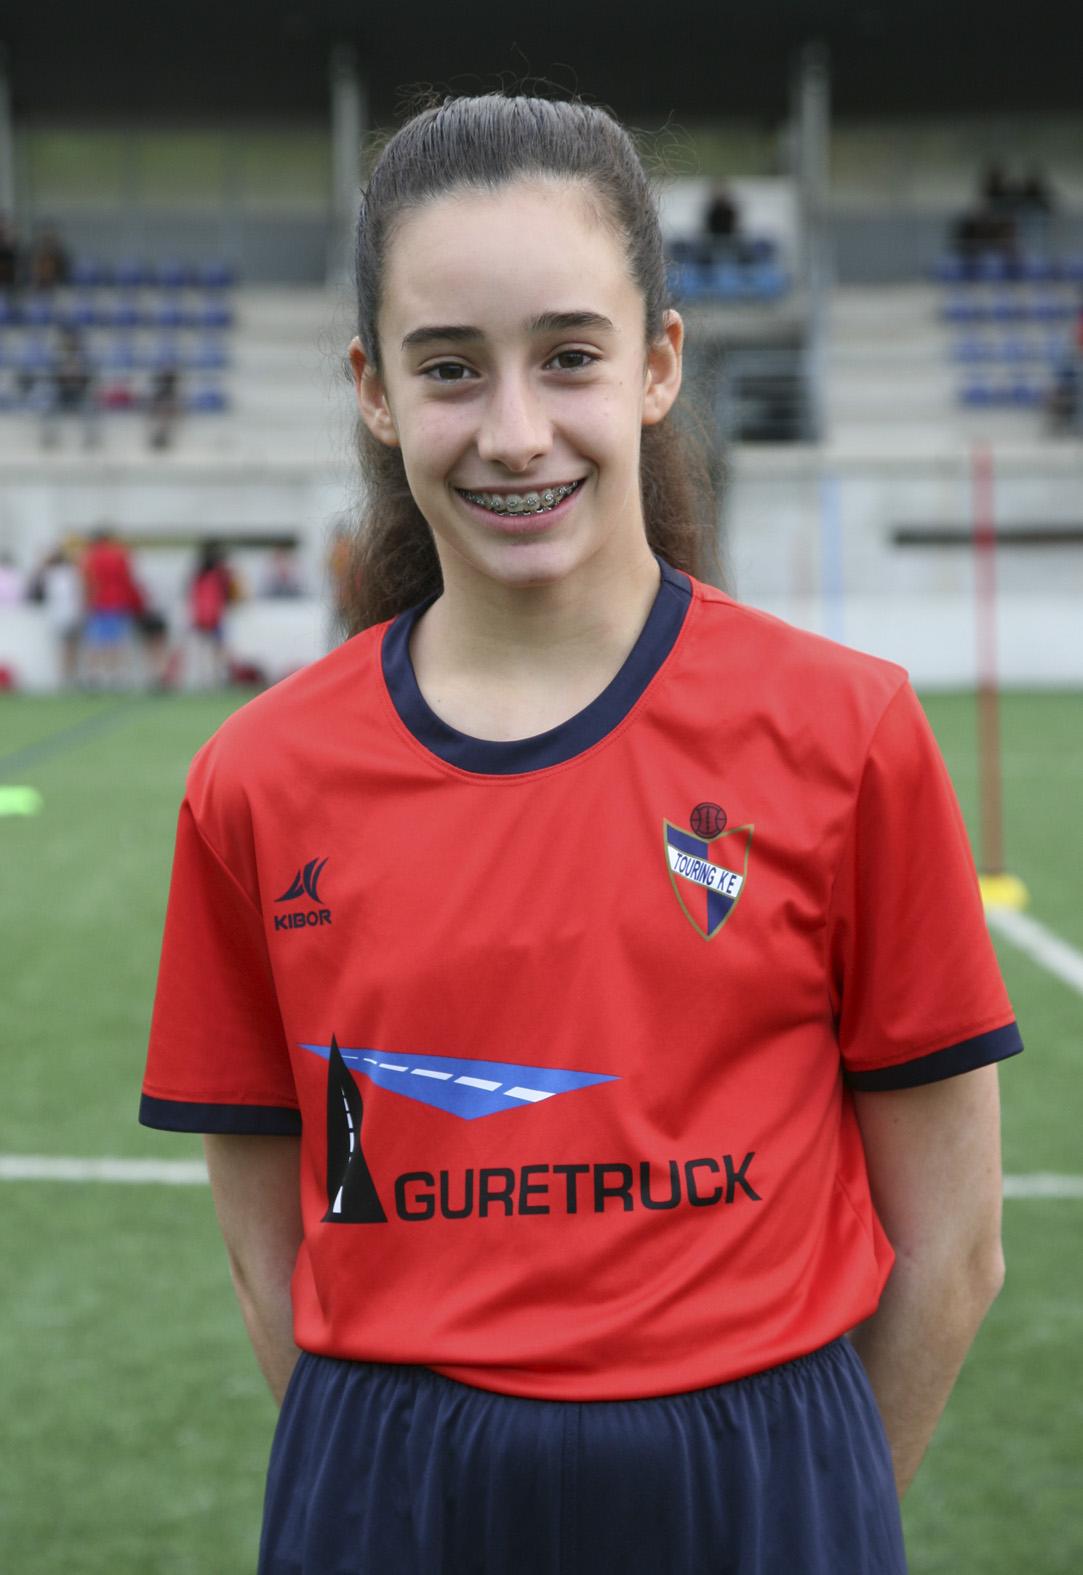 Nora Sierra